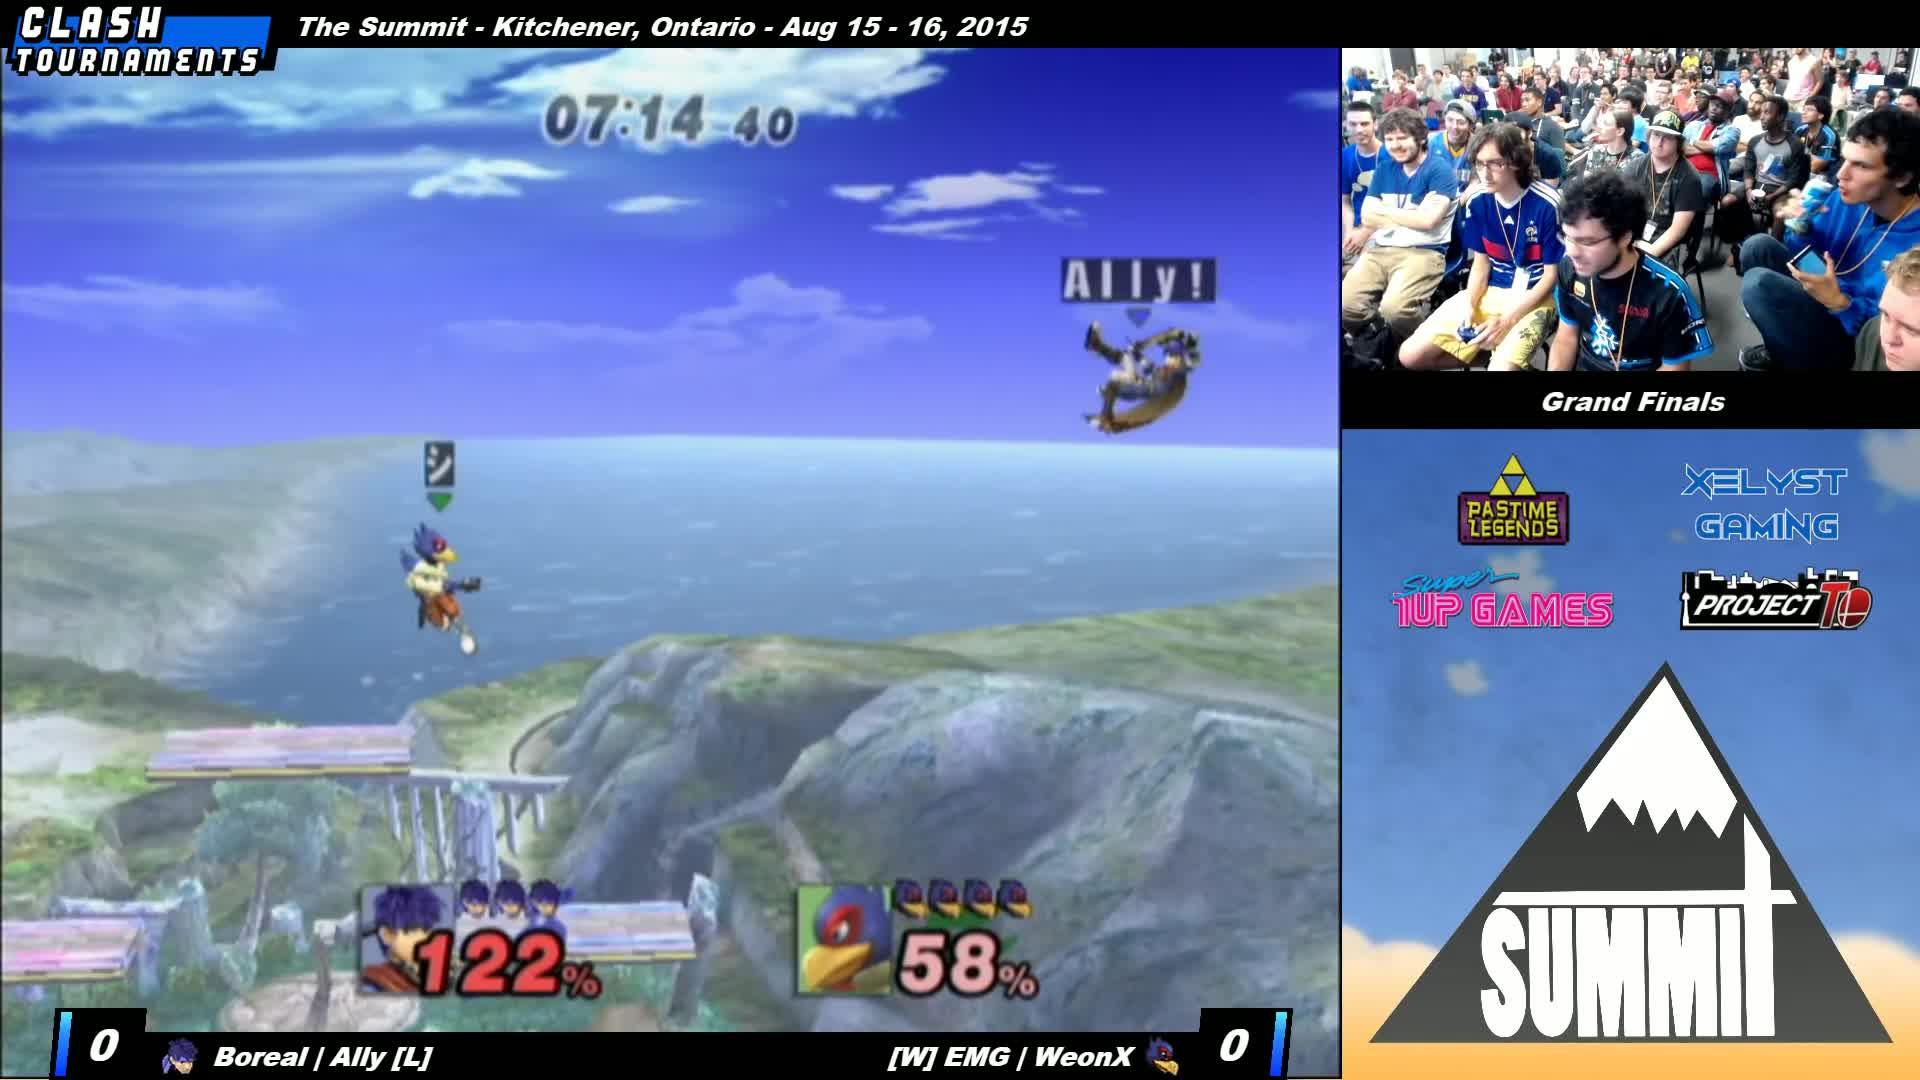 brawl, mod, pm, smash 4, smashgifs, smashtournament, ssmb, super smash bros. brawl, super smash bros. for nintendo 3ds and wii u (video game), super smash bros. melee, tournament, Jump Cancel Ike - Summit - Ally (Ike) vs Weon-X (Falco) - Grand Finals - Project M GIFs